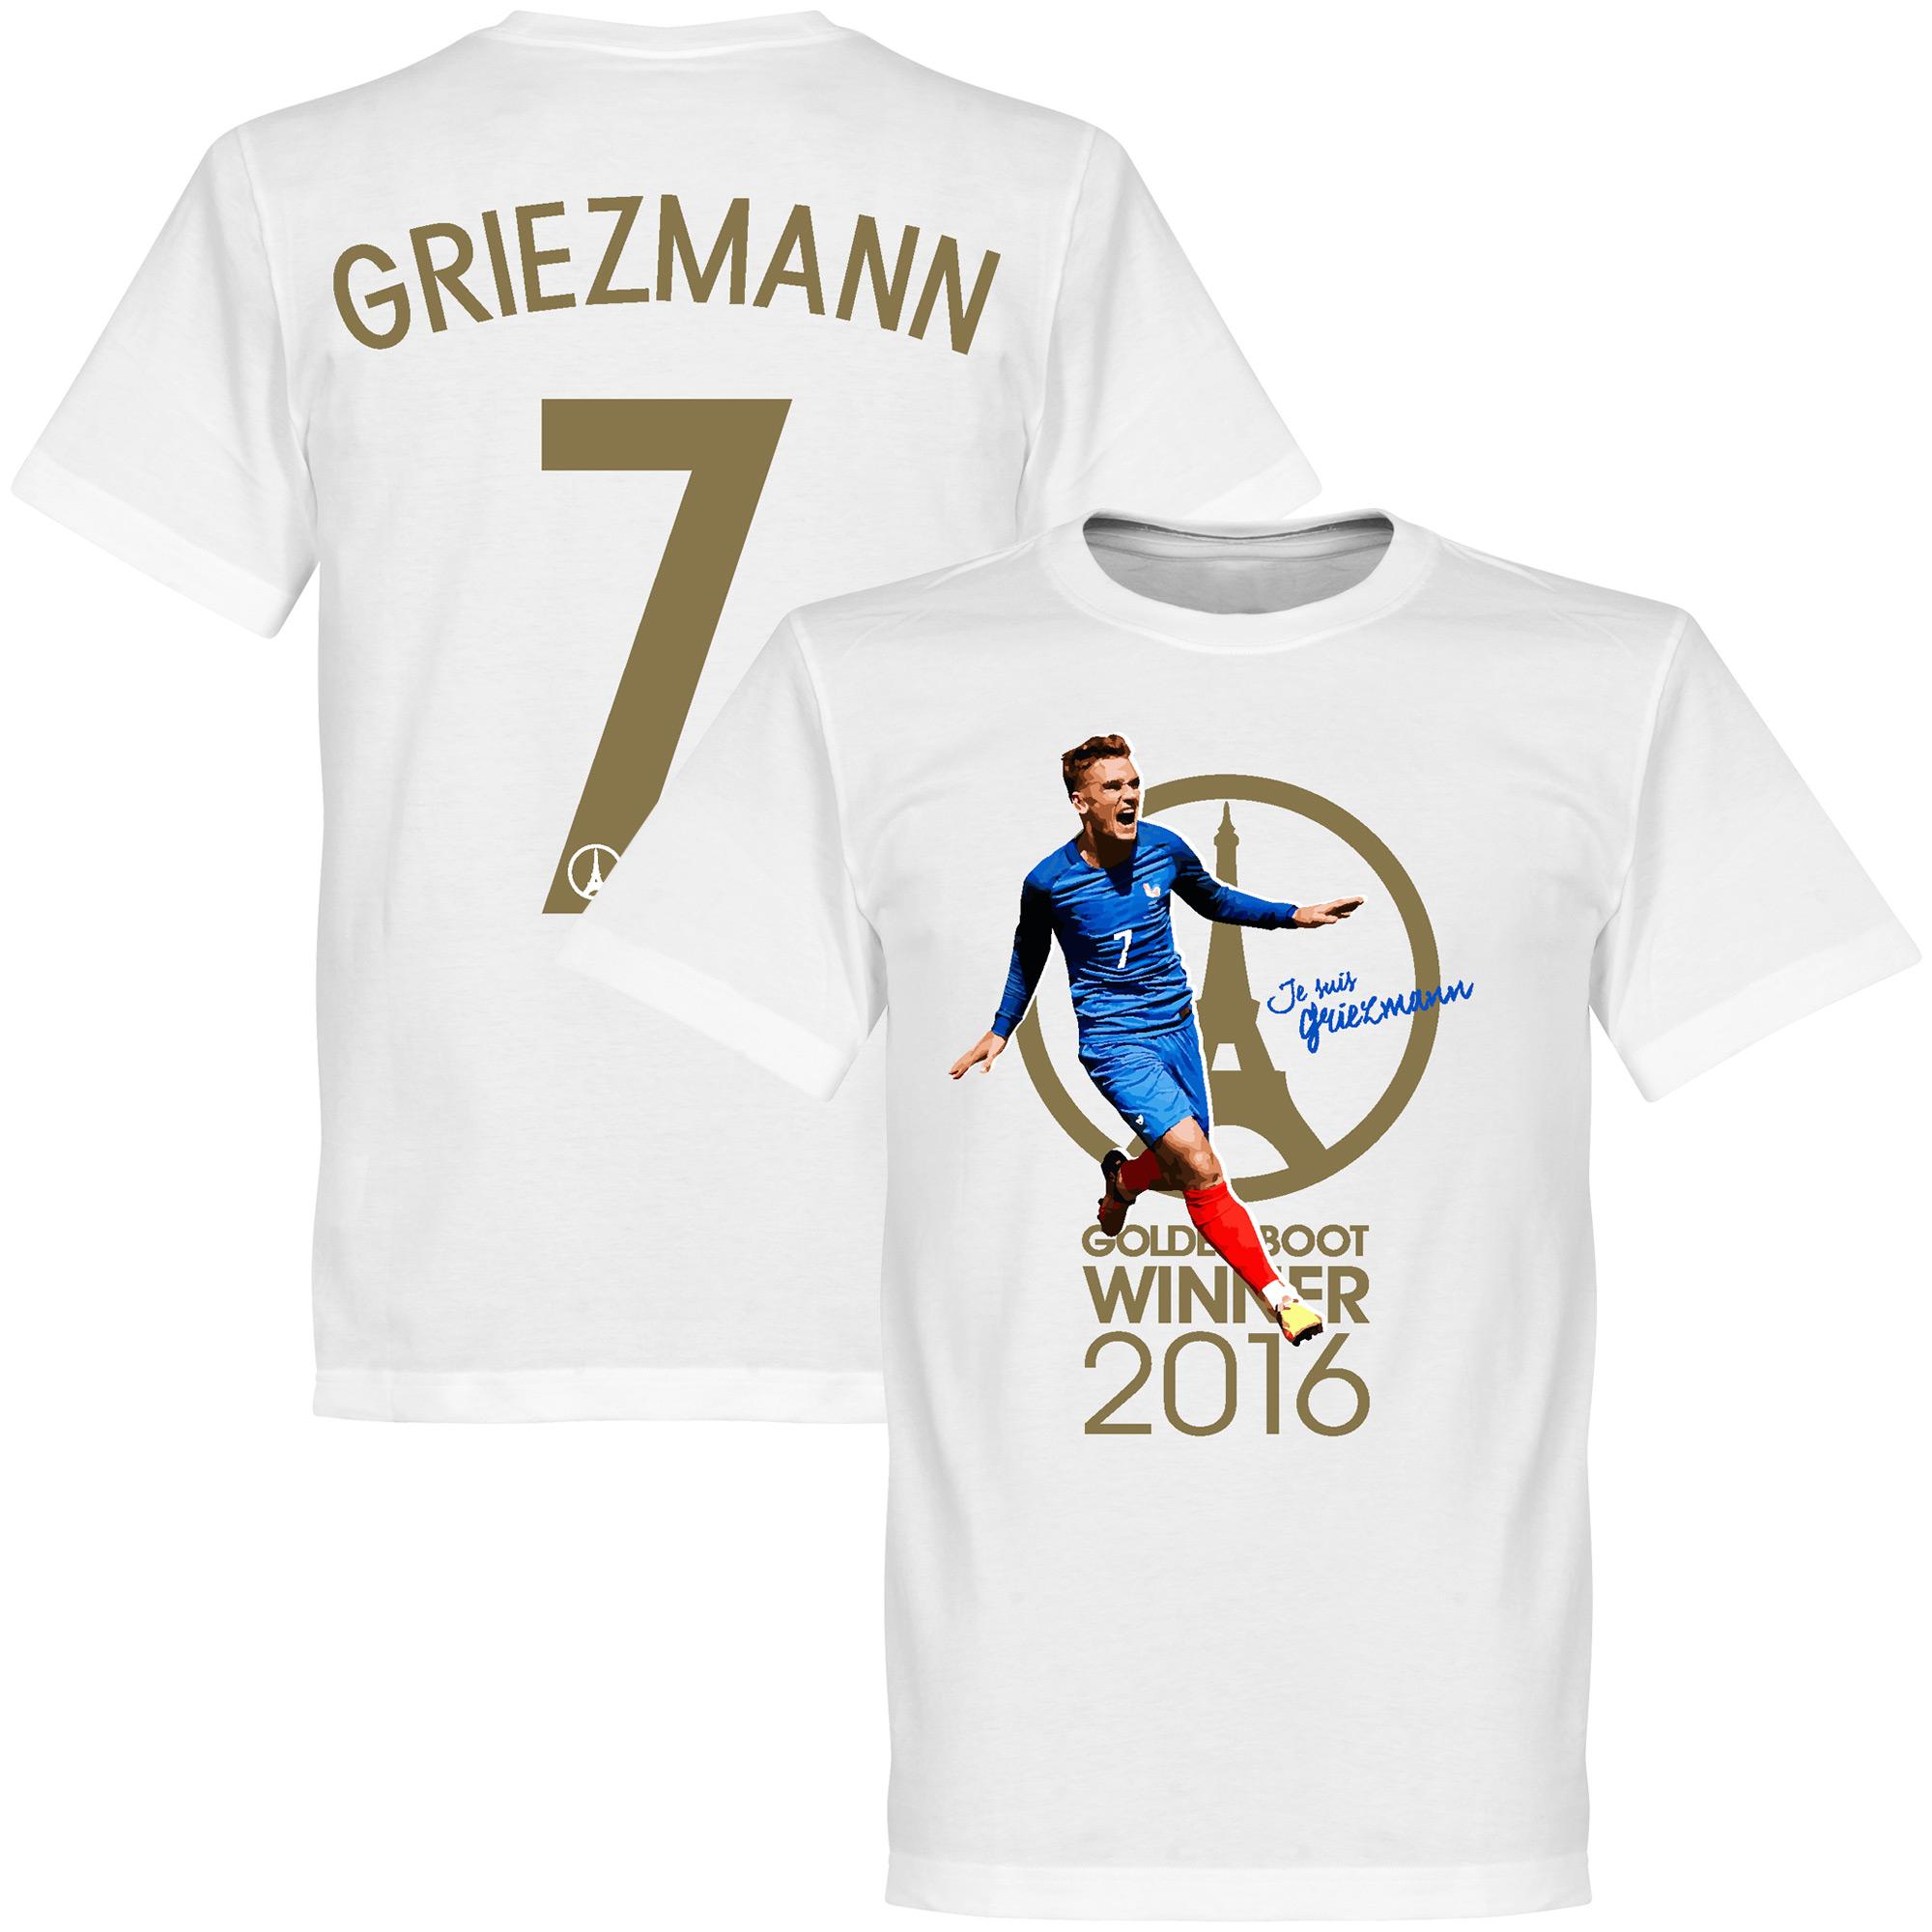 Je Suis Griezmann France 2016 Golden Boot Winner KIDS Tee - White - 2